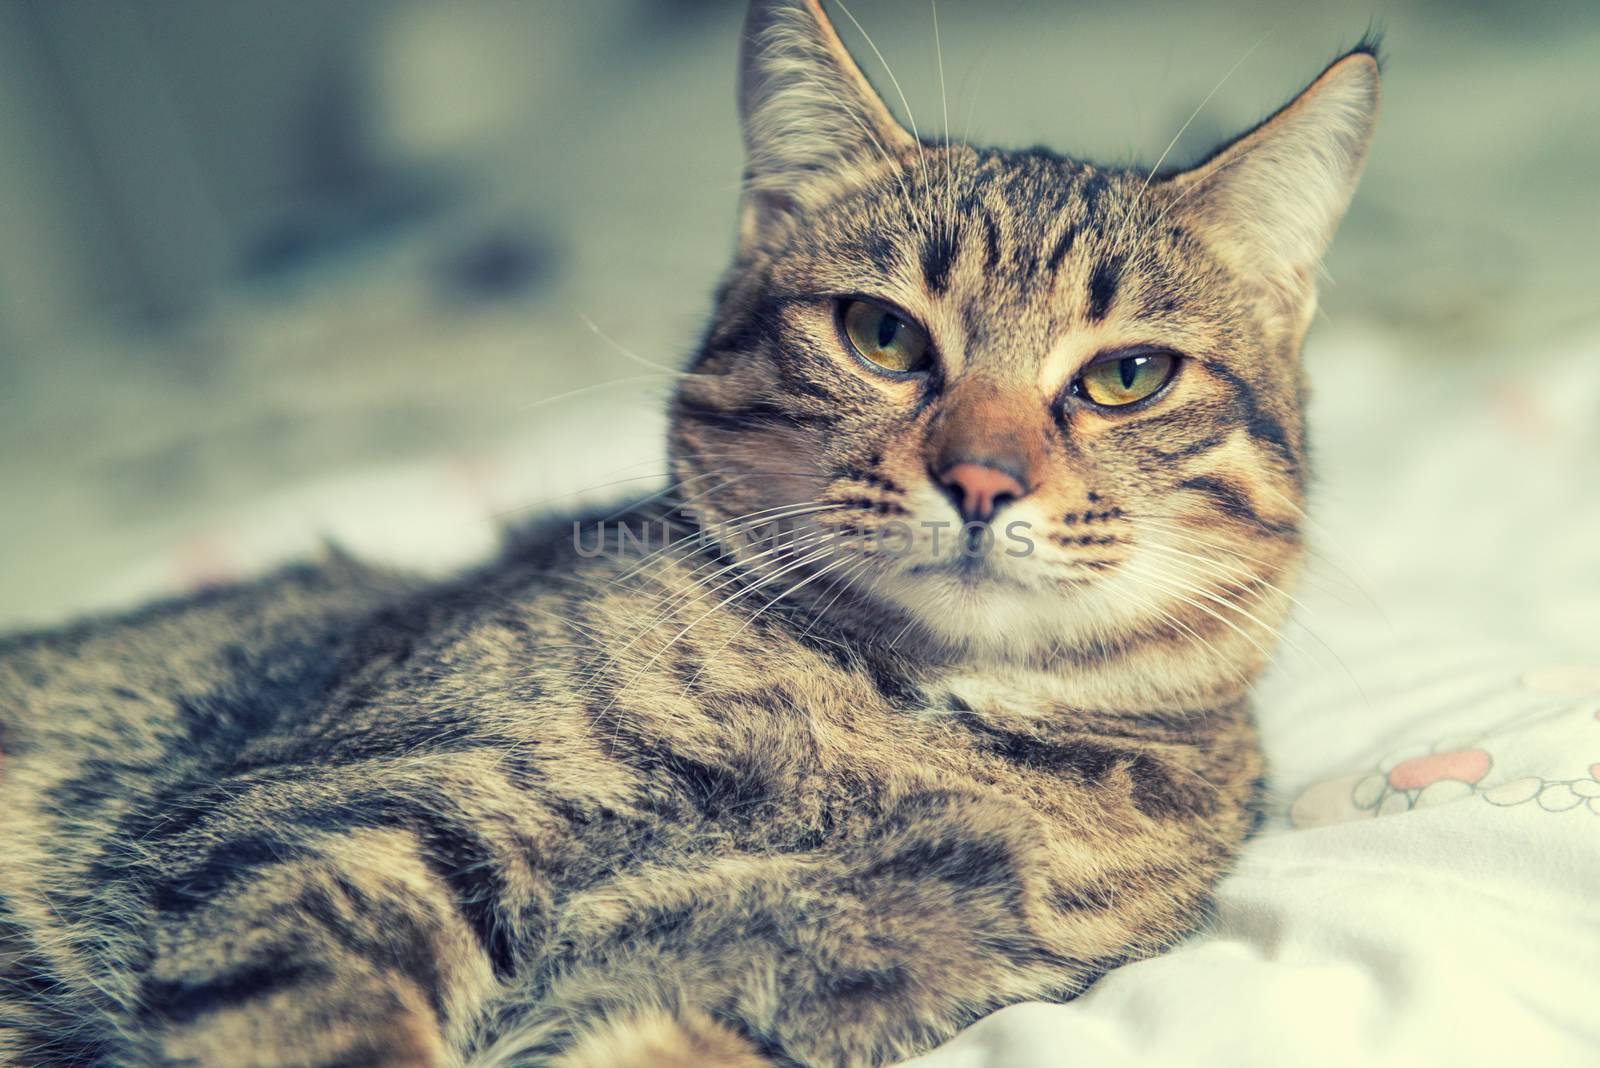 Tabby cat relaxing